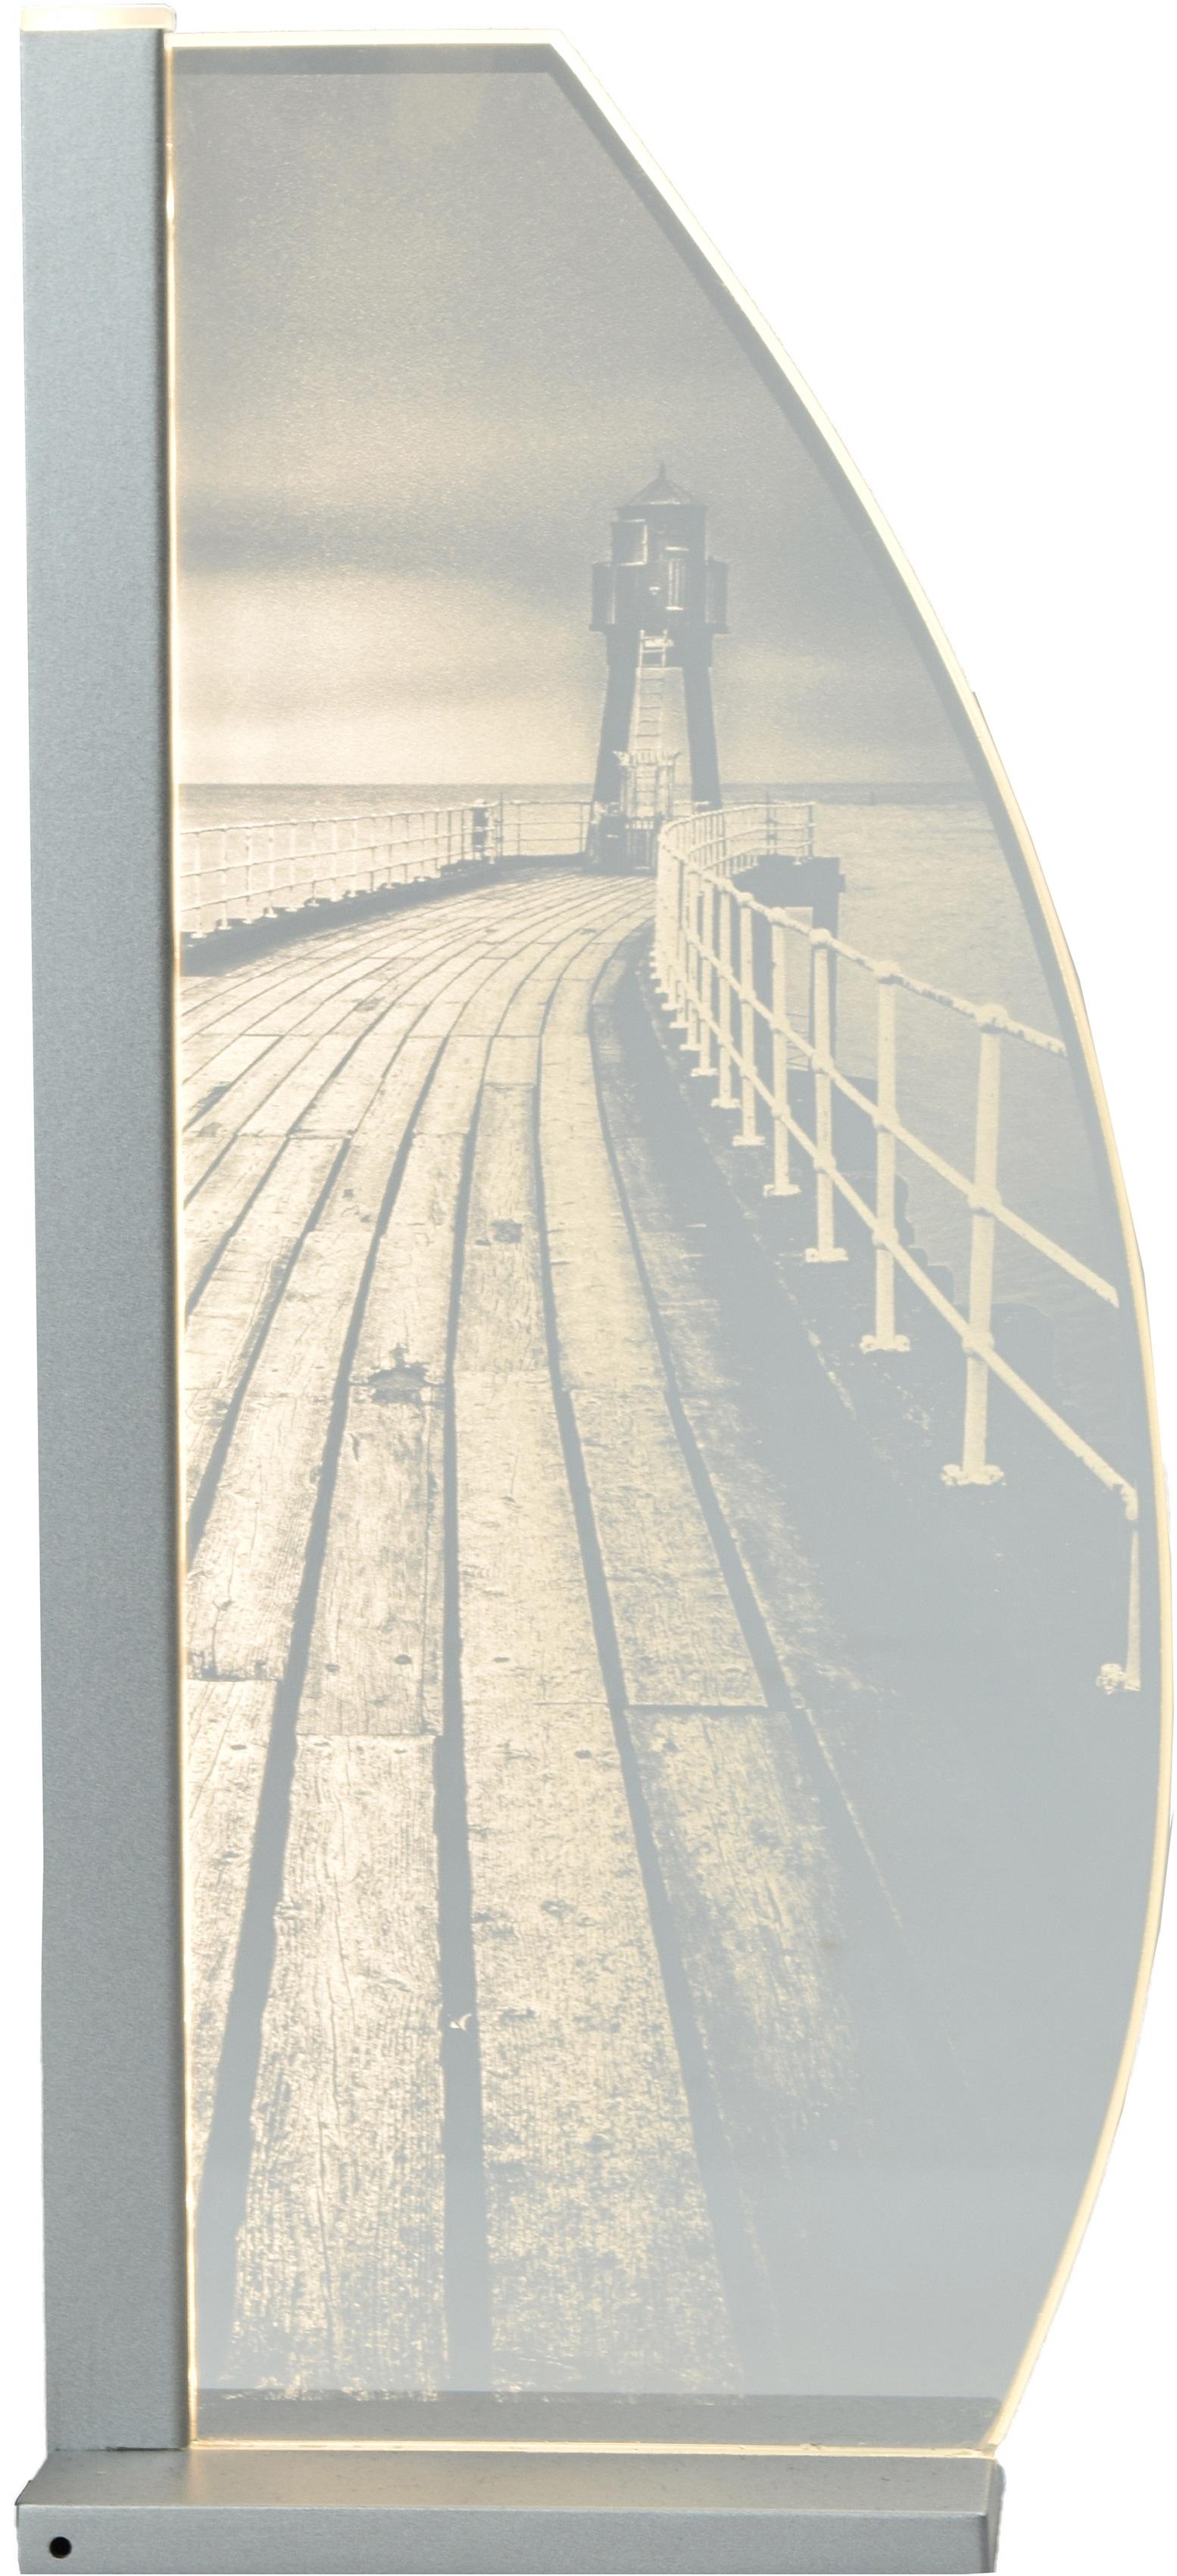 LUVERRE LED Tischleuchte Lighthouse, LED-Board, 1 St., Optisches Glas, Laserinnengravur, Lighthouse LED Tischleuchte